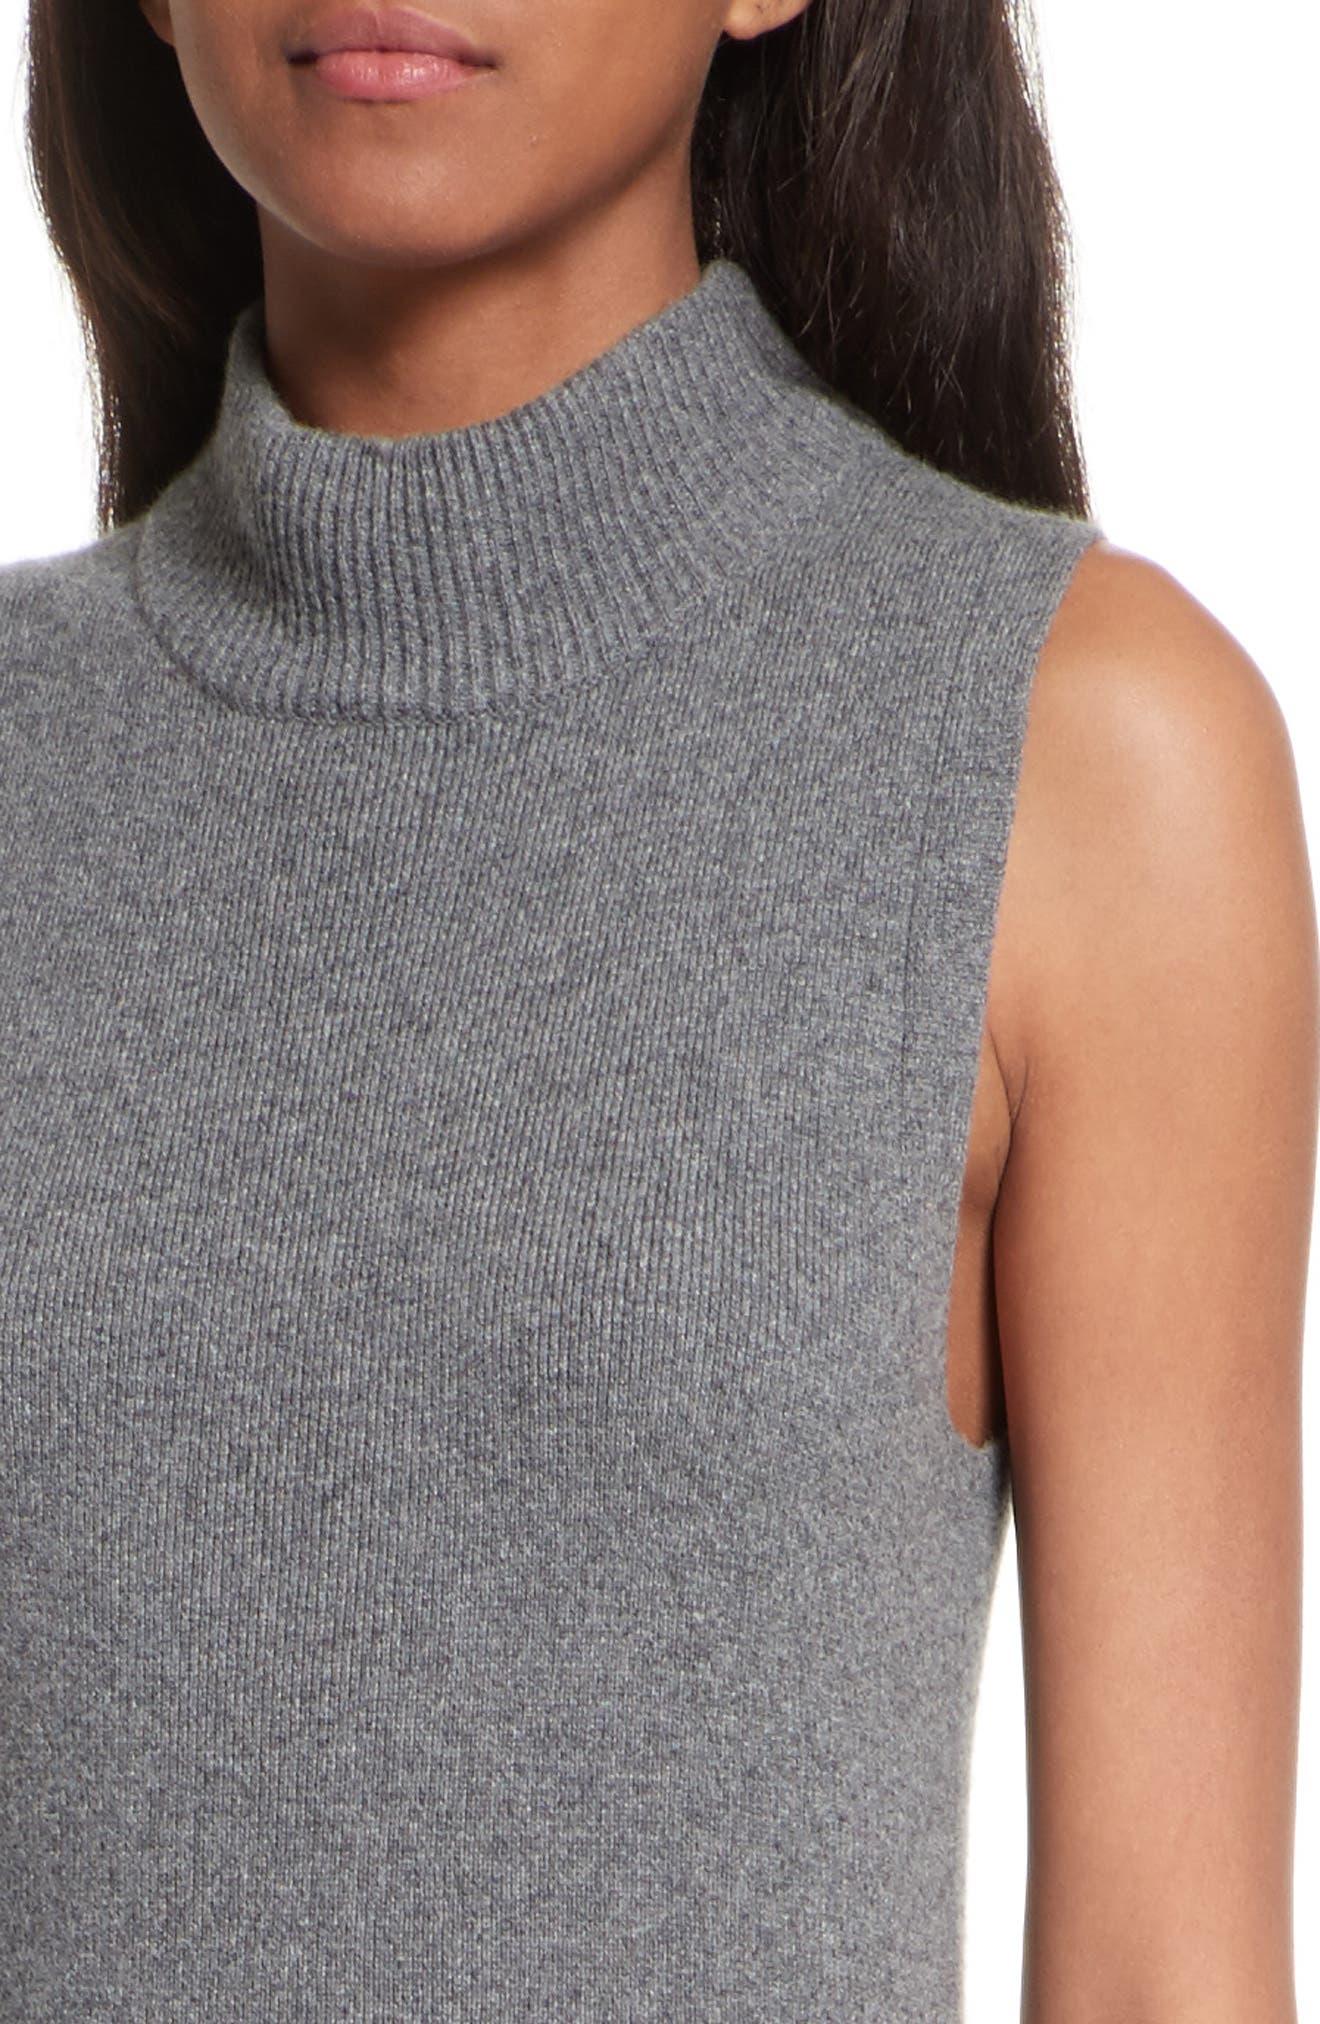 Ace Cashmere Mock Neck Sweater Dress,                             Alternate thumbnail 4, color,                             060